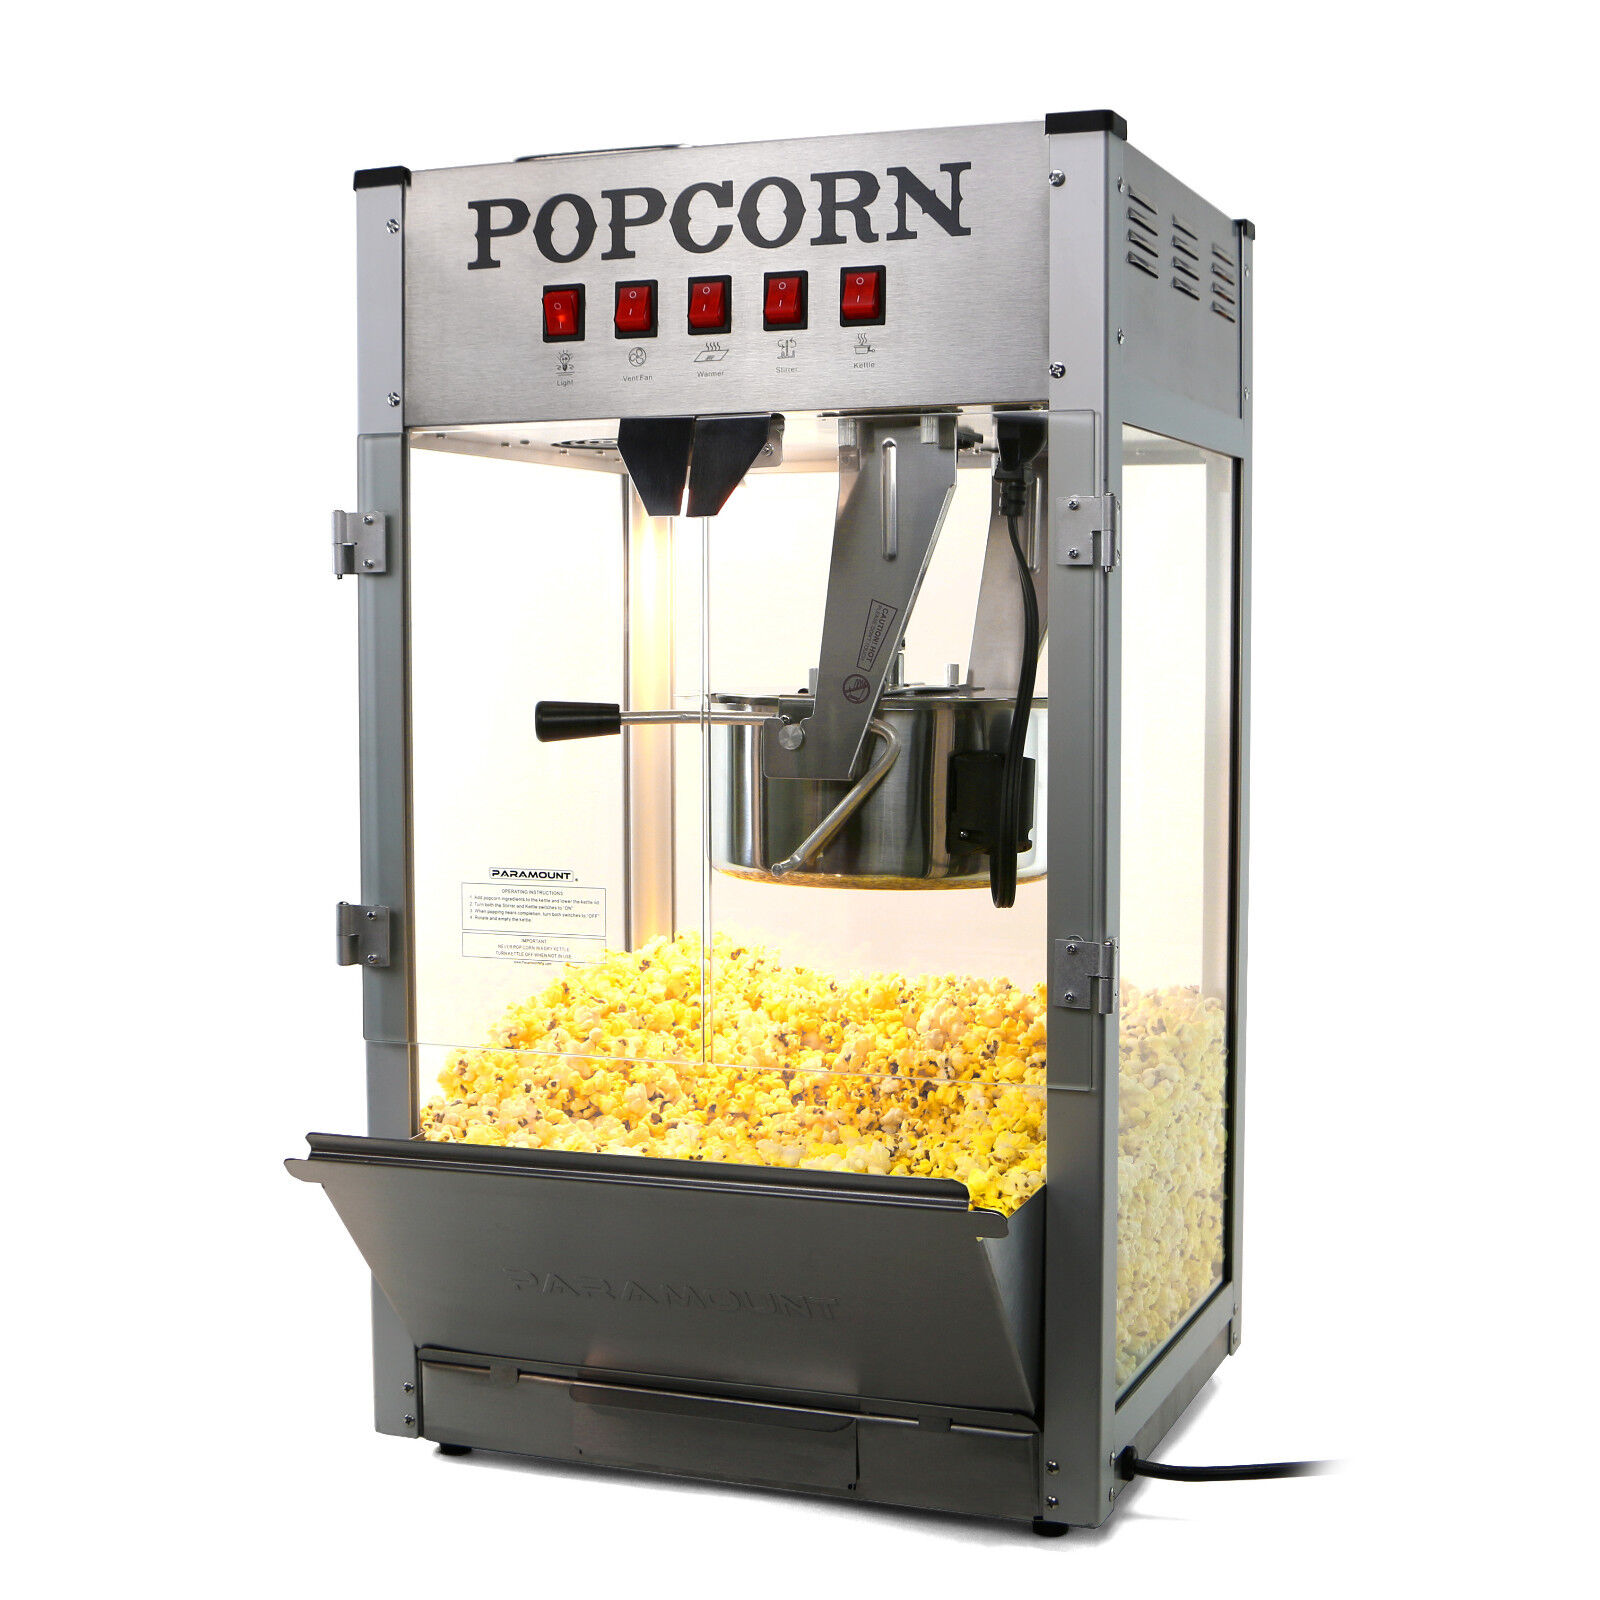 16oz commercial popcorn maker machine 16 oz